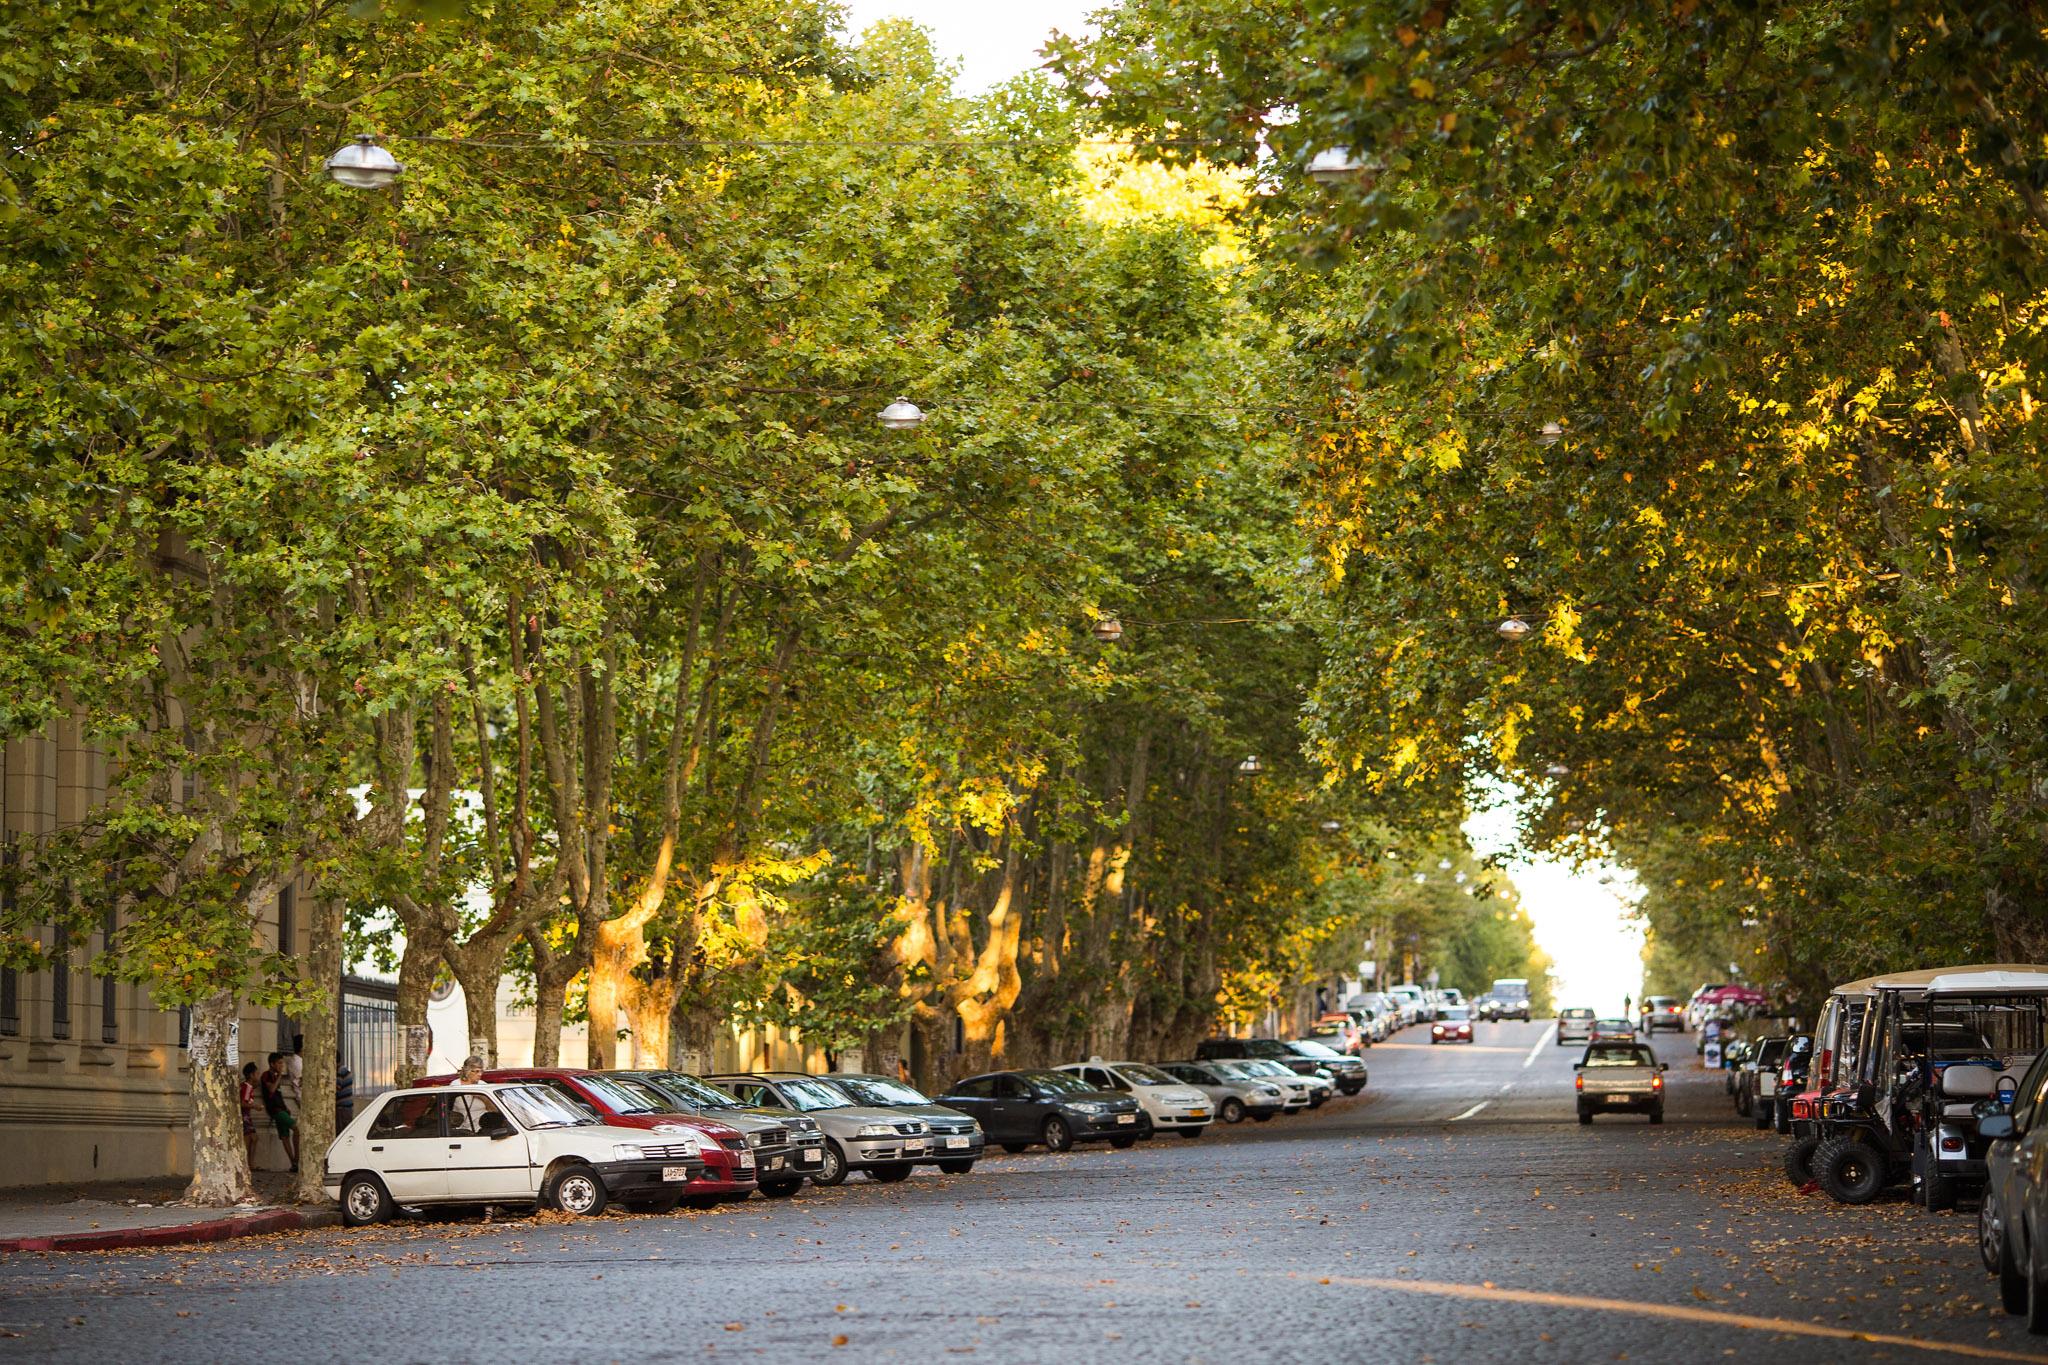 wedding-travellers-destination-photography-overlanding-south-america-uruguay-colonia-del-sacramento-avenue-trees-street-road-cars-nice-green-sunset